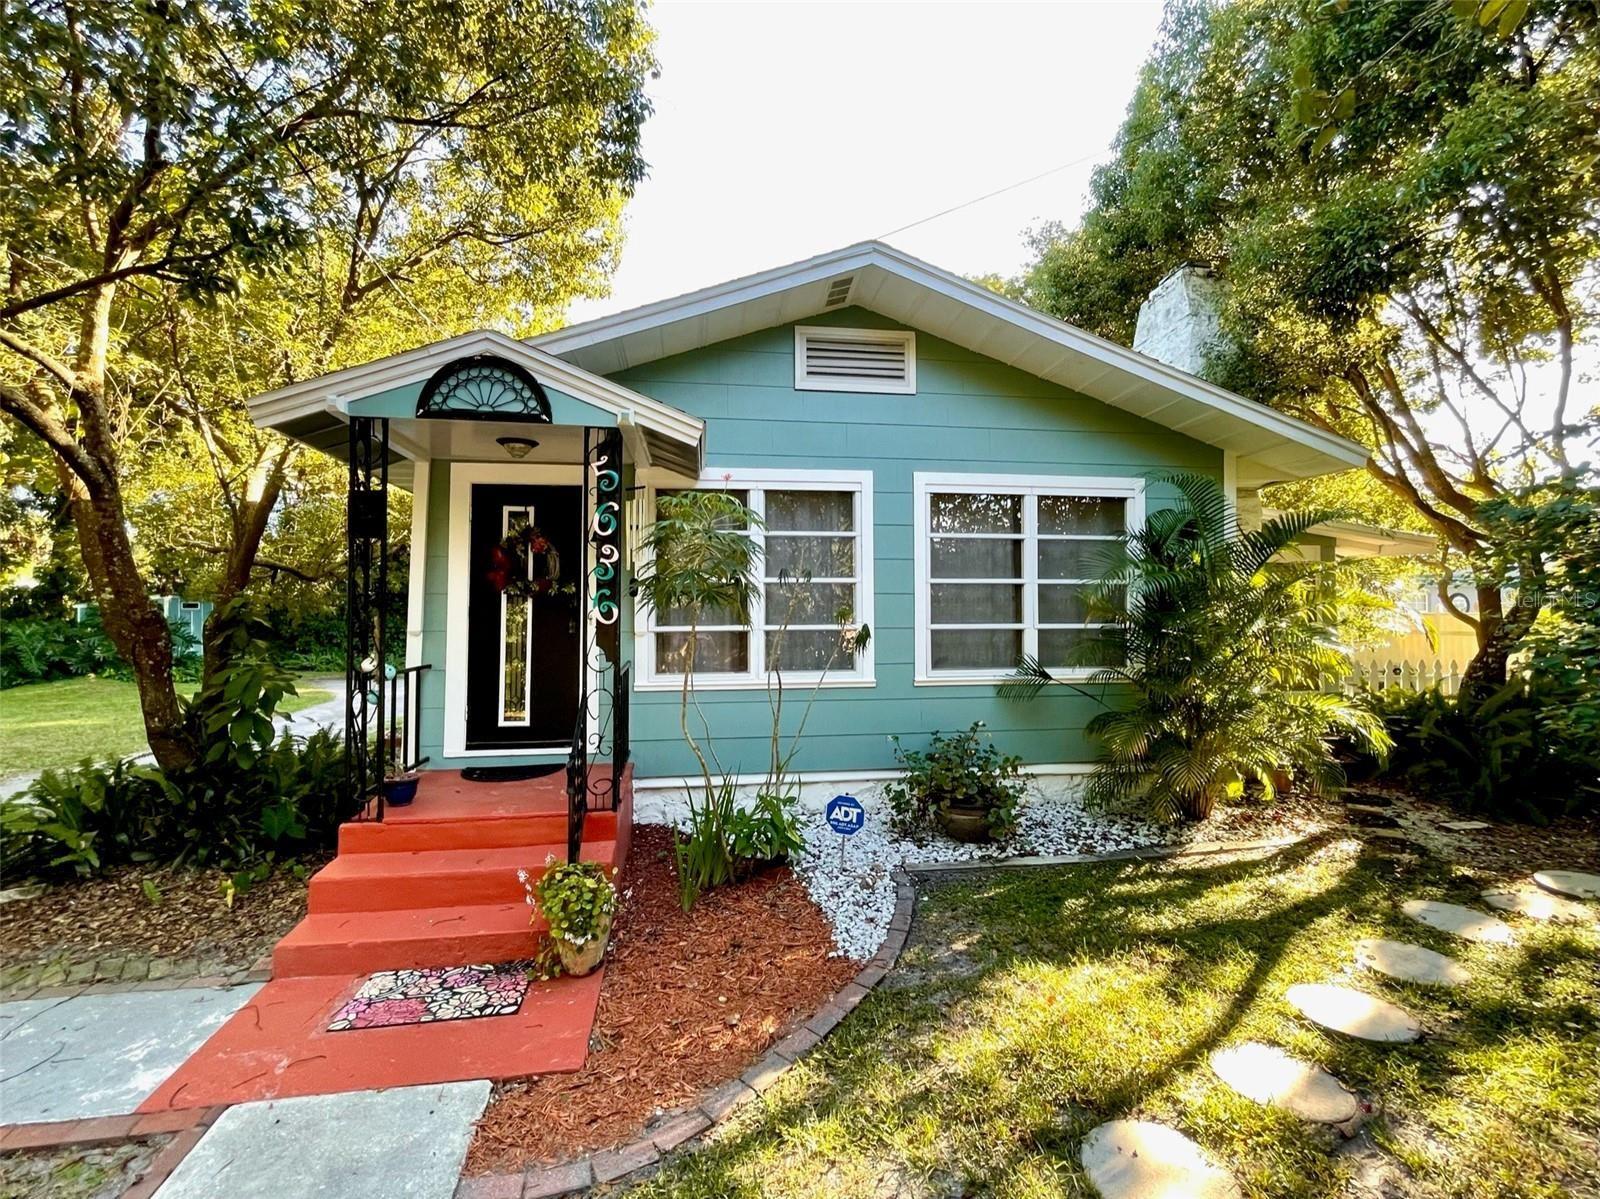 5636 HOMECREST ROAD, New Port Richey, FL 34652 - MLS#: U8139704